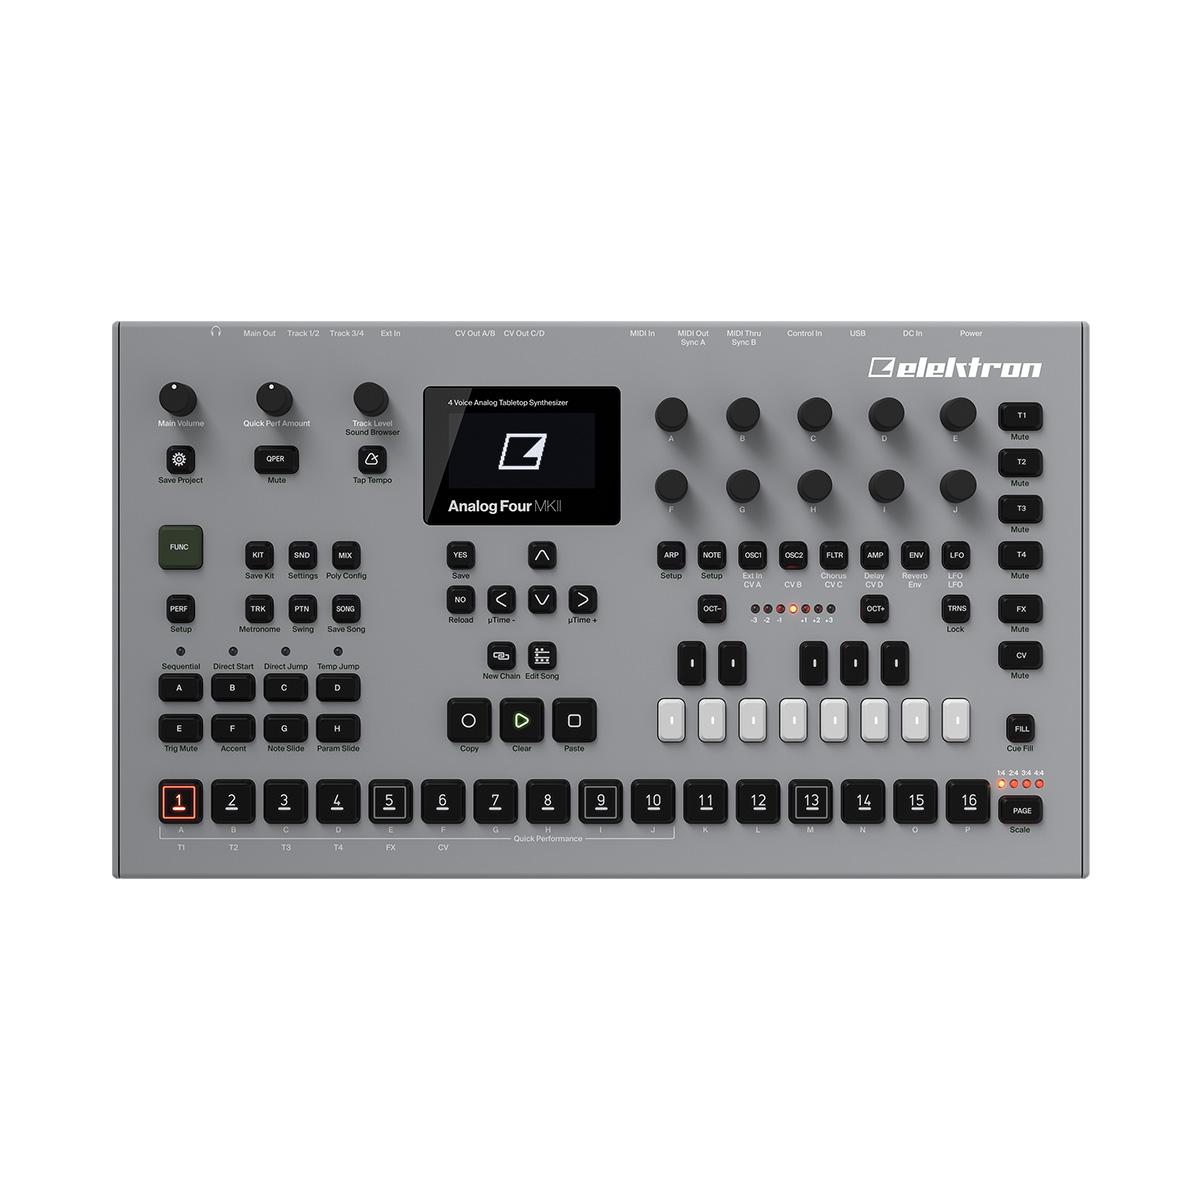 elektron Analog Four MK II アナログシンセサイザー 【エレクトロン】